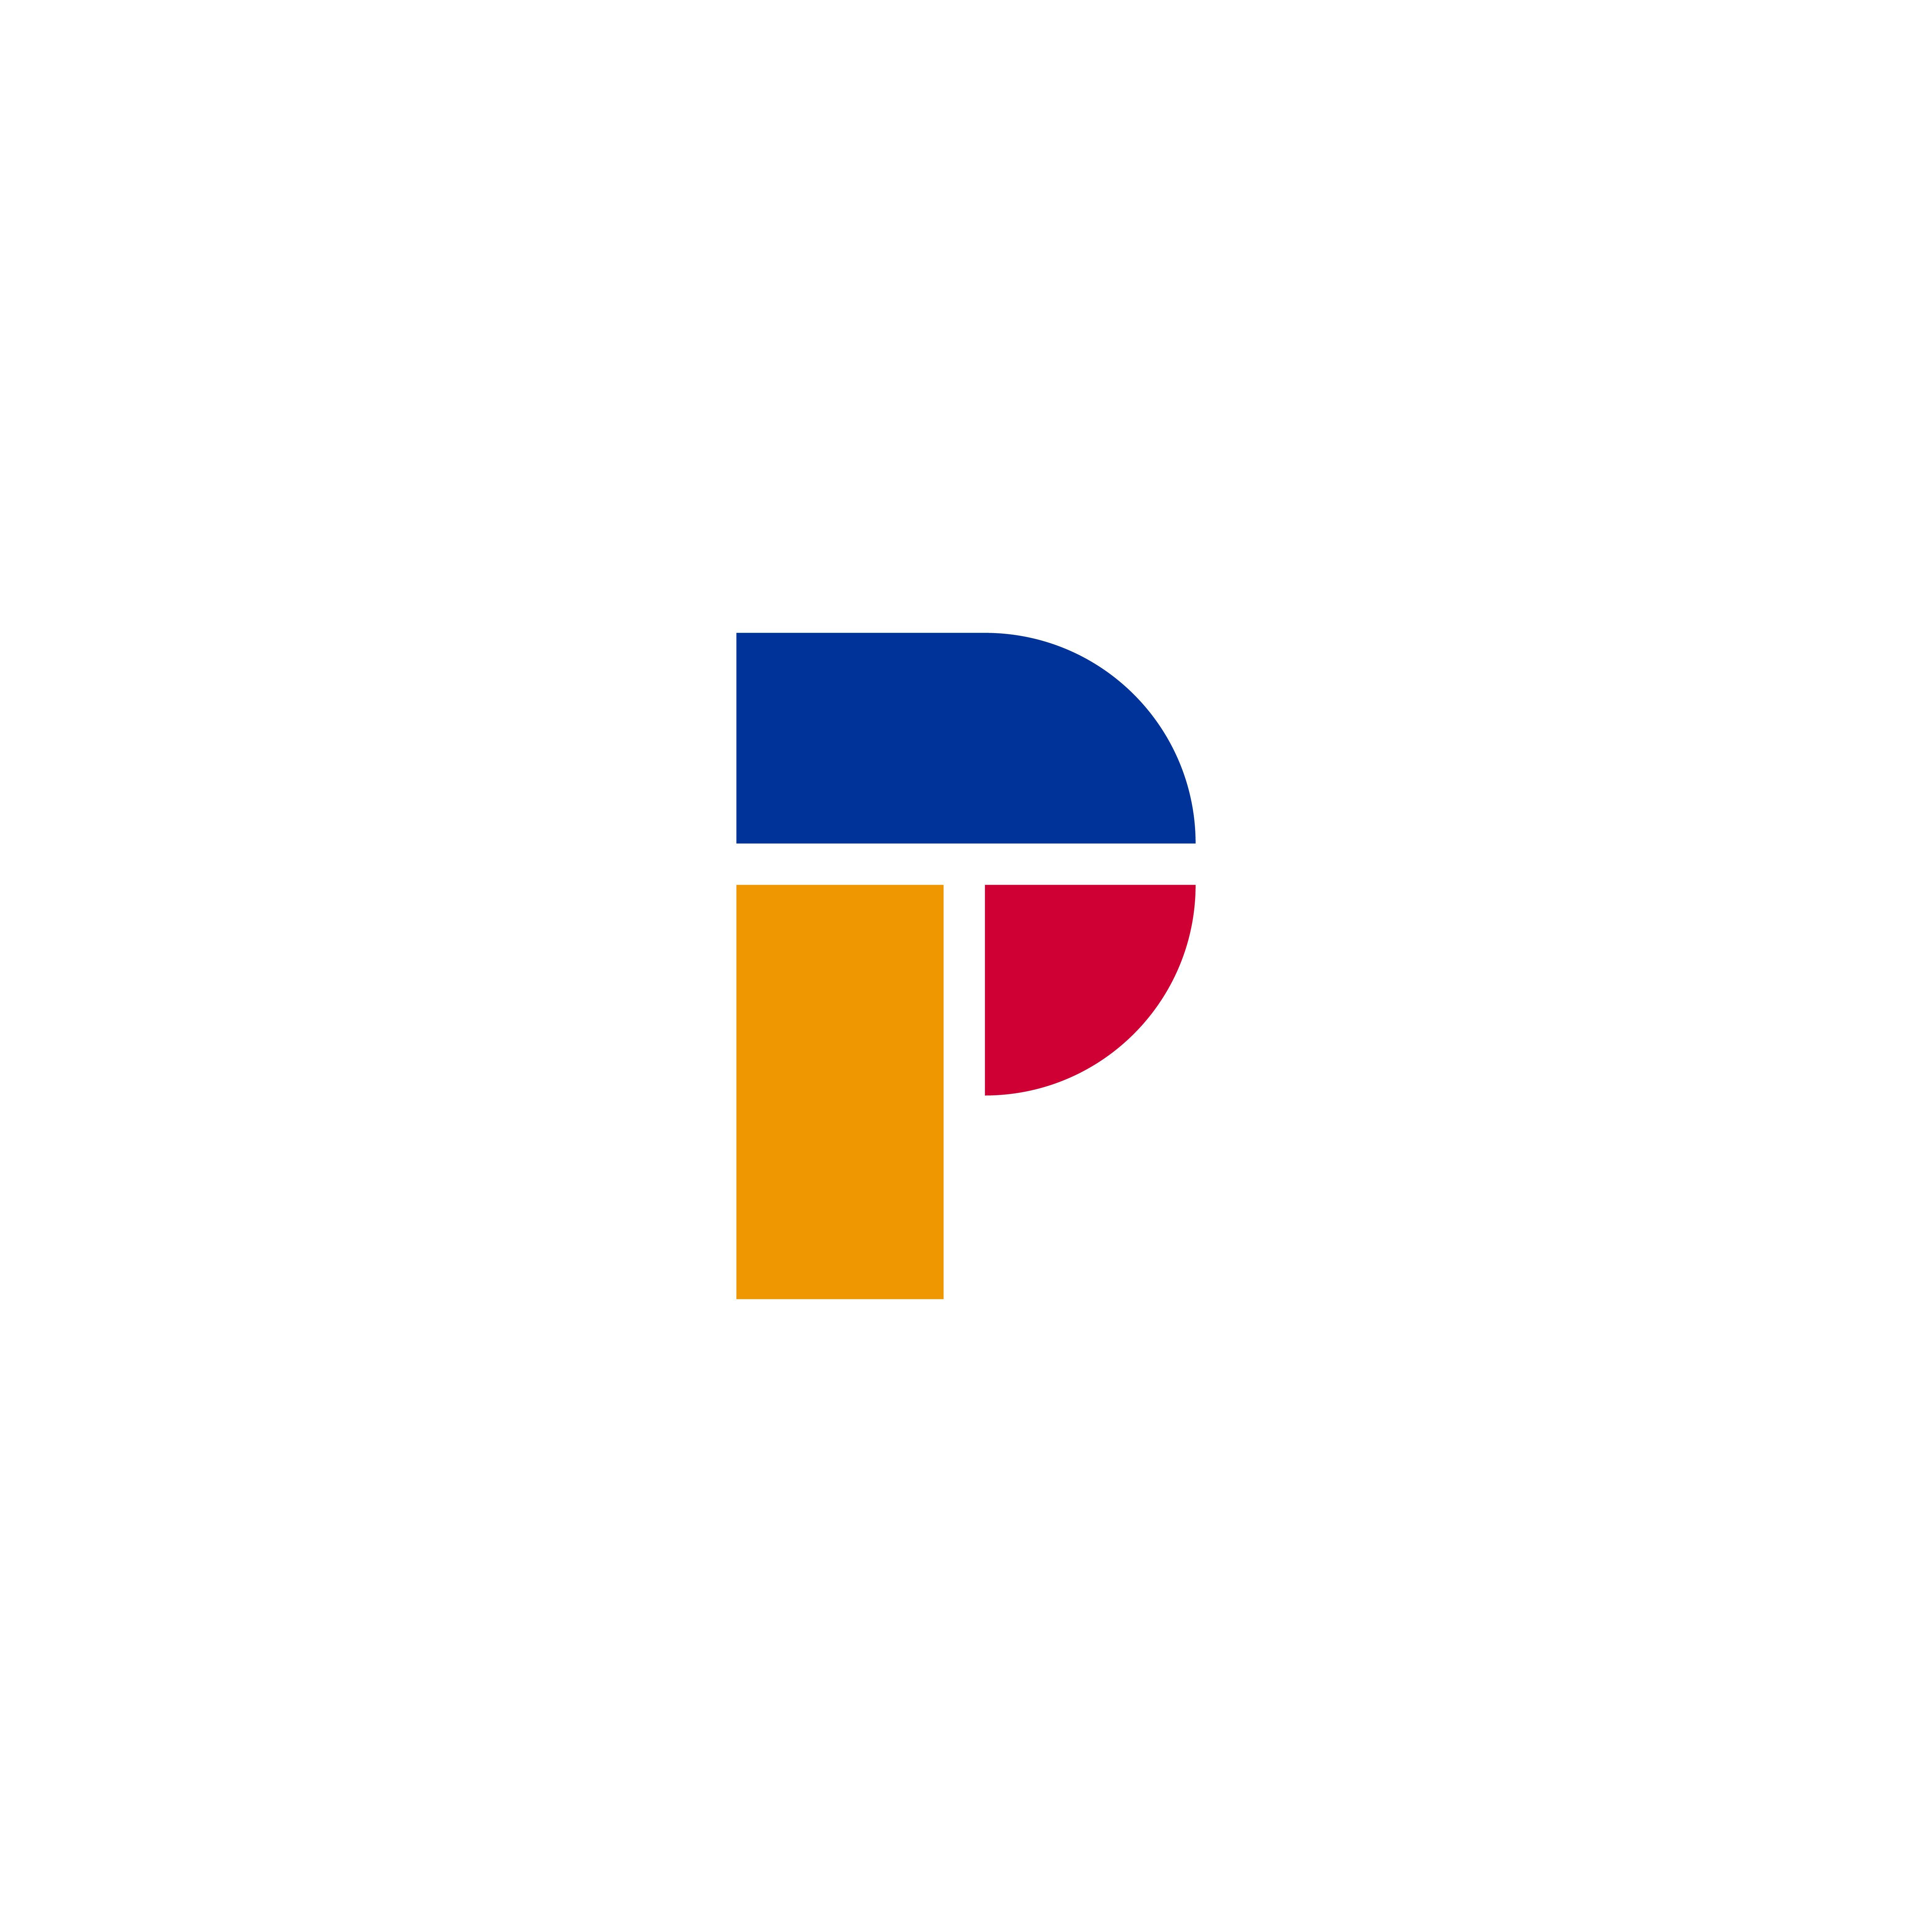 paint geometric logo thirty logos thirty logos pinterest rh pinterest com au paint logos ideas paint logos on grass